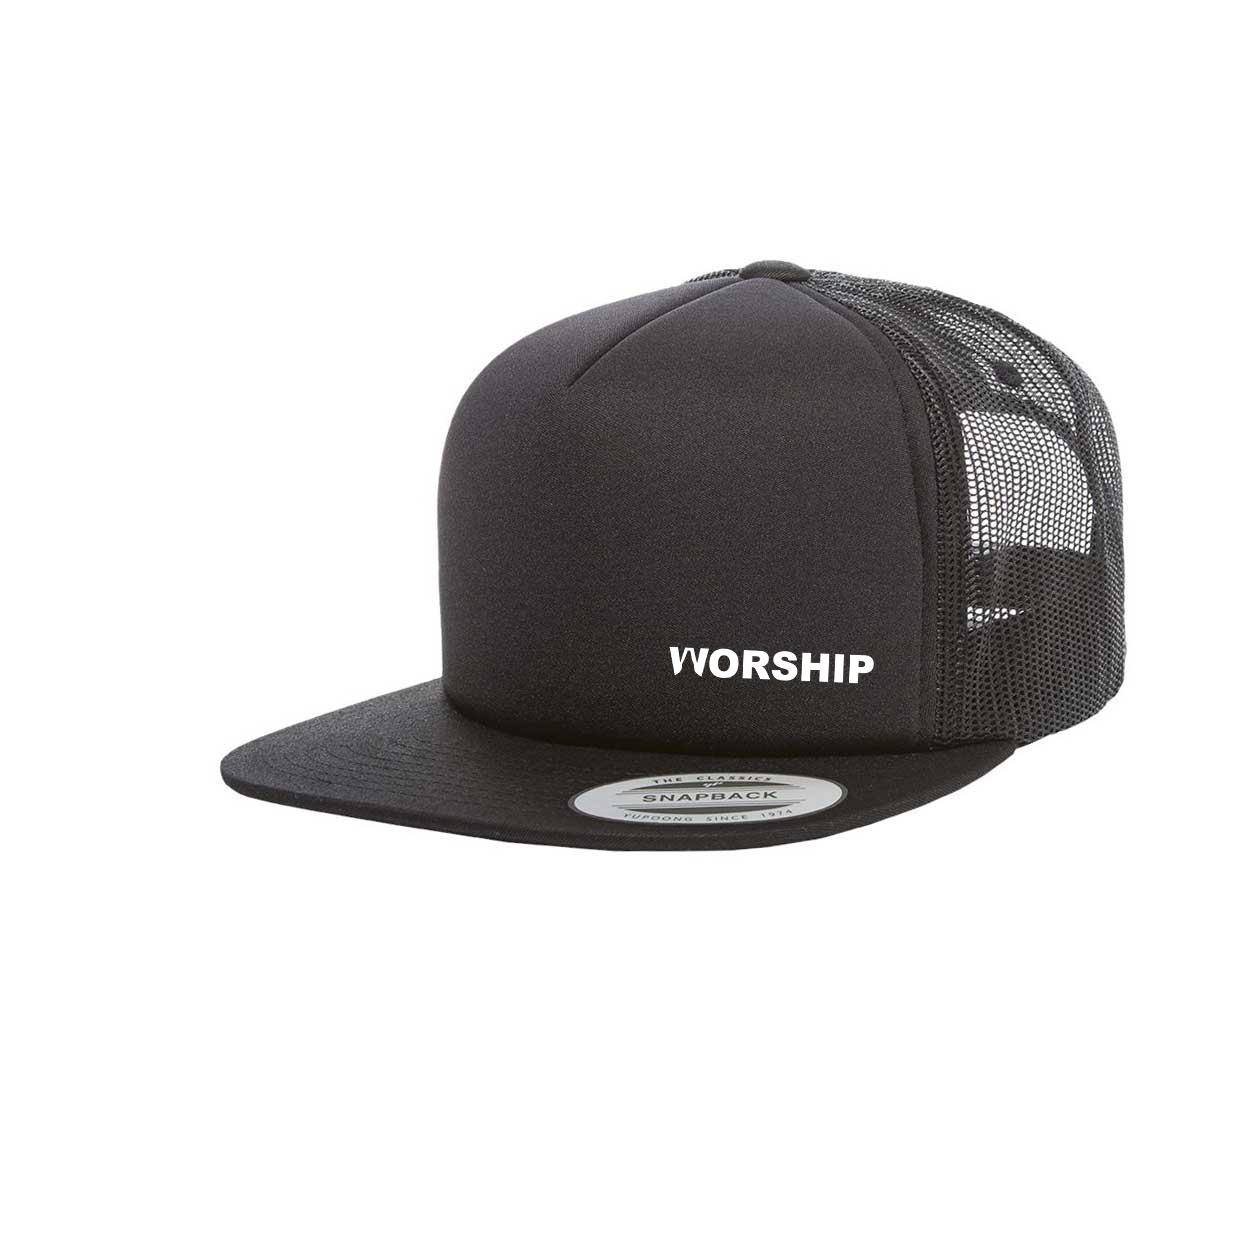 Worship Pray Logo Night Out Premium Foam Flat Brim Snapback Hat Black (White Logo)